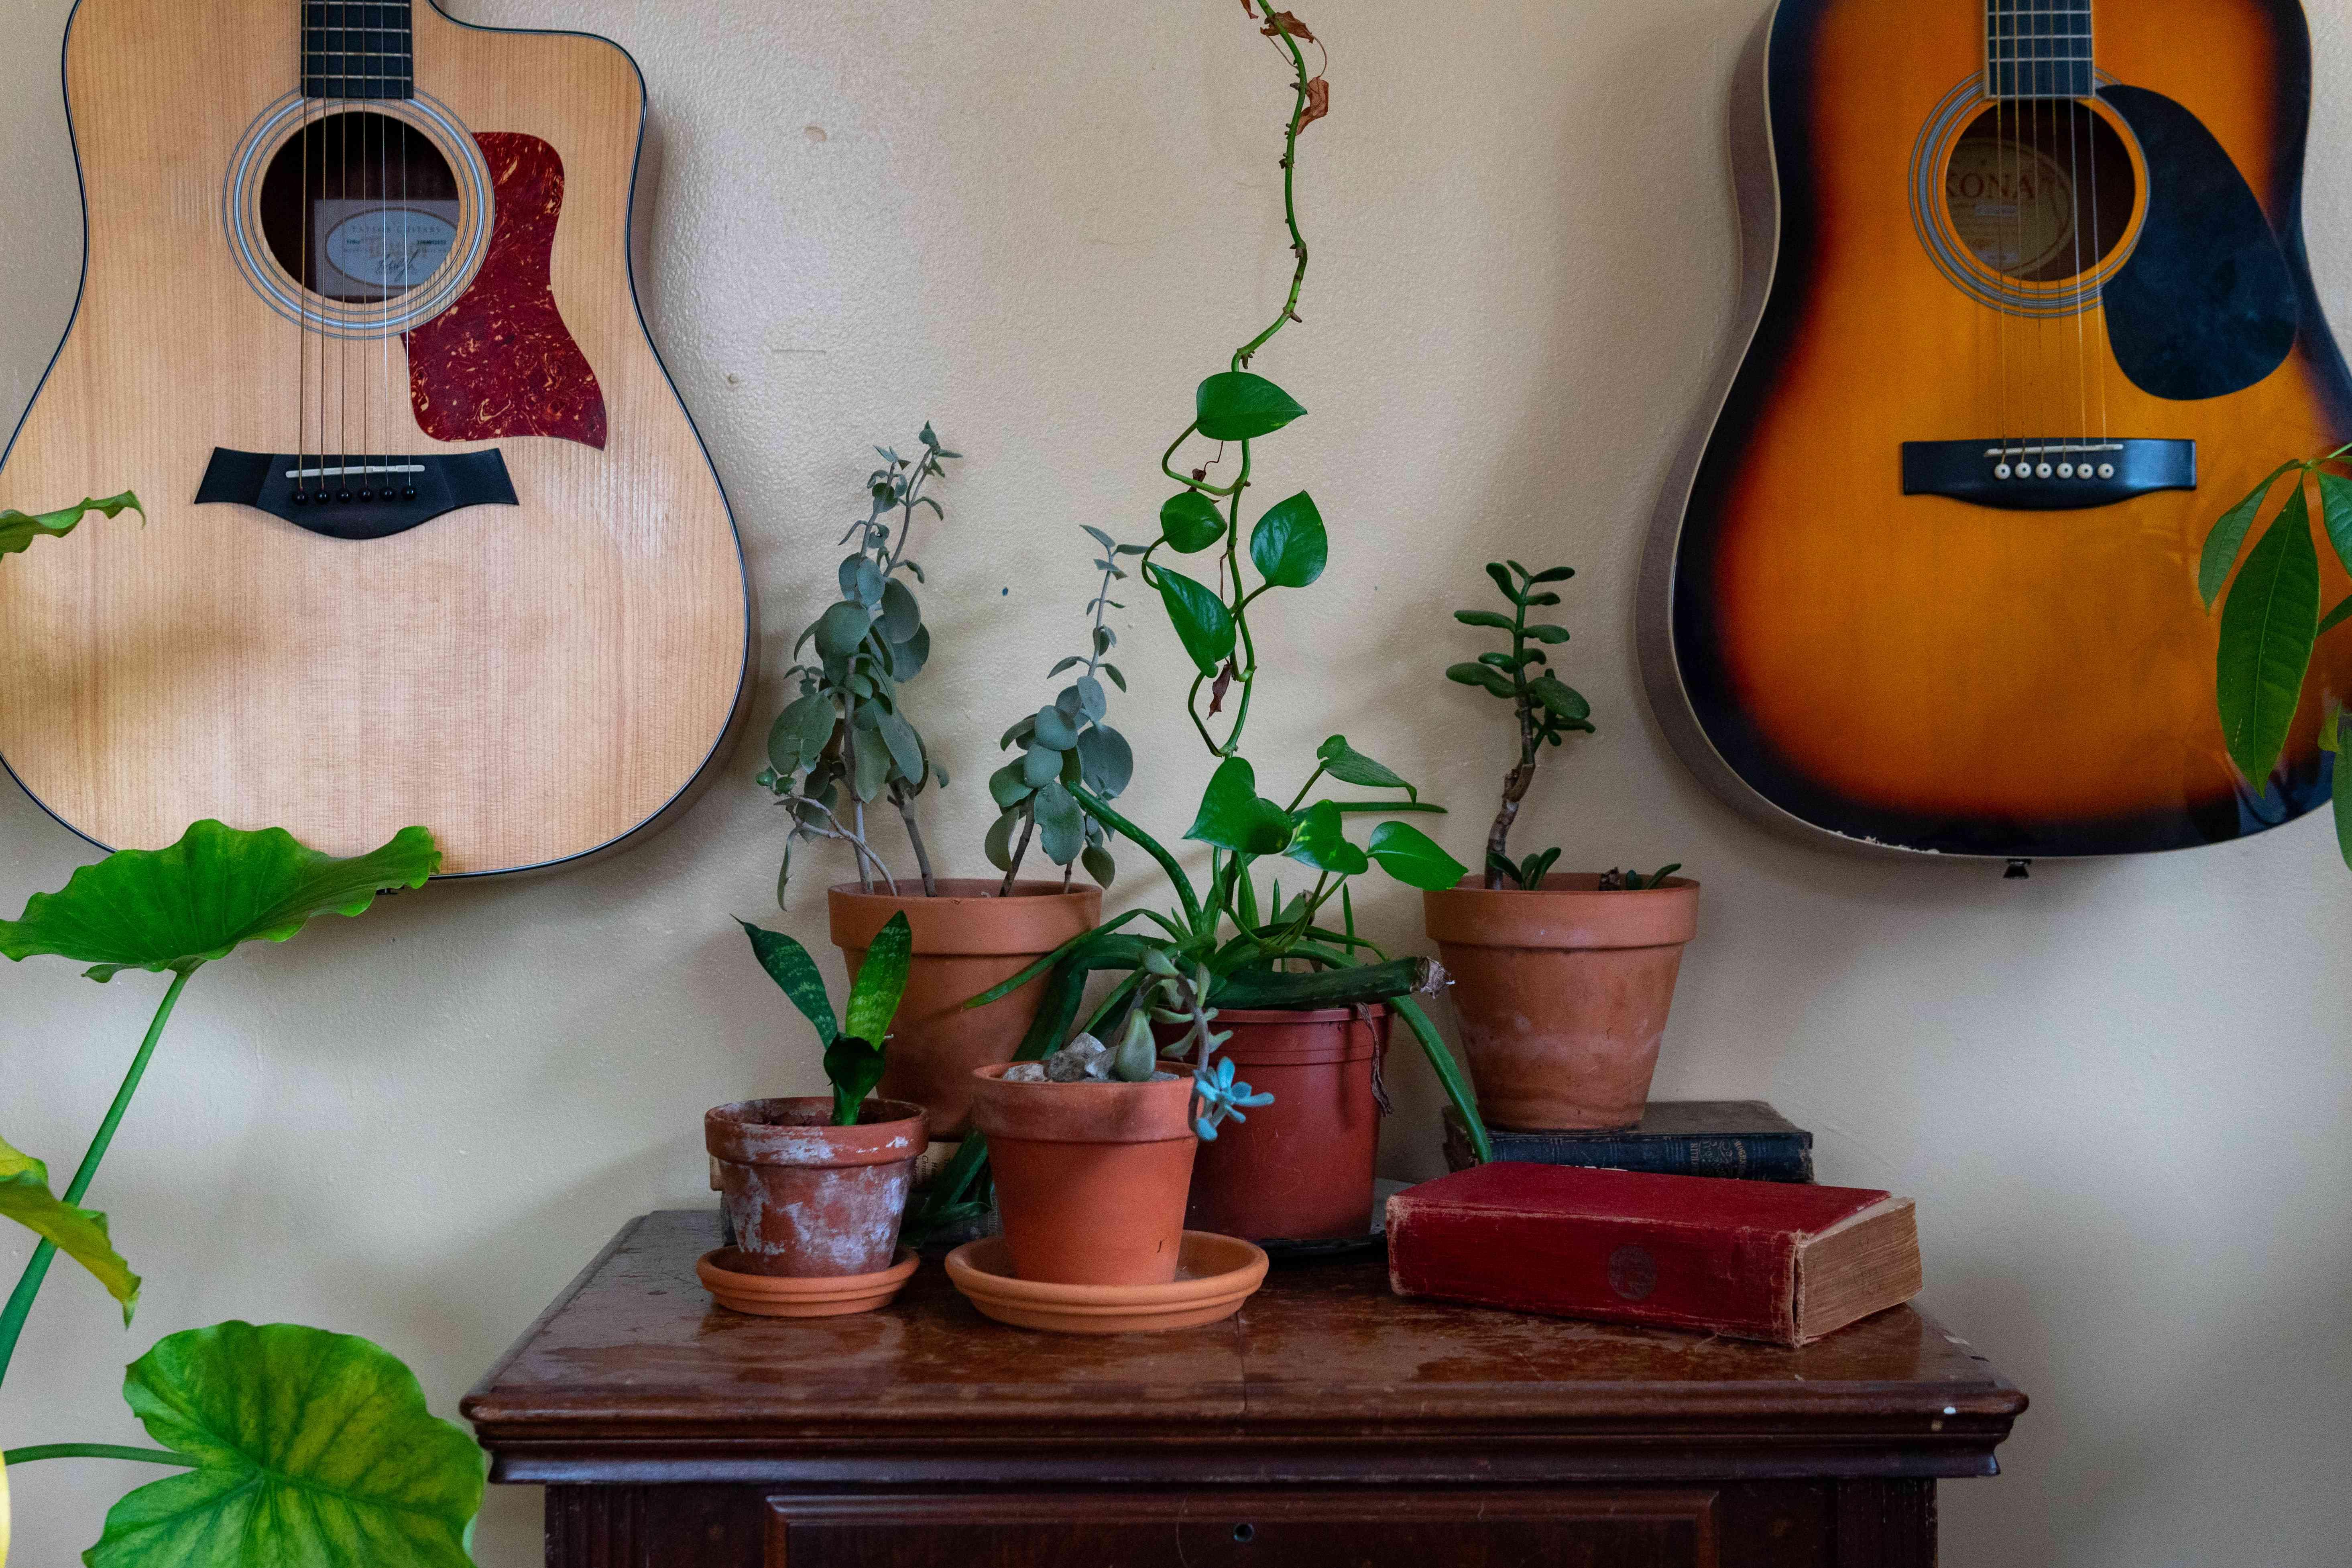 keep house plants mold free while guitars hang on wall